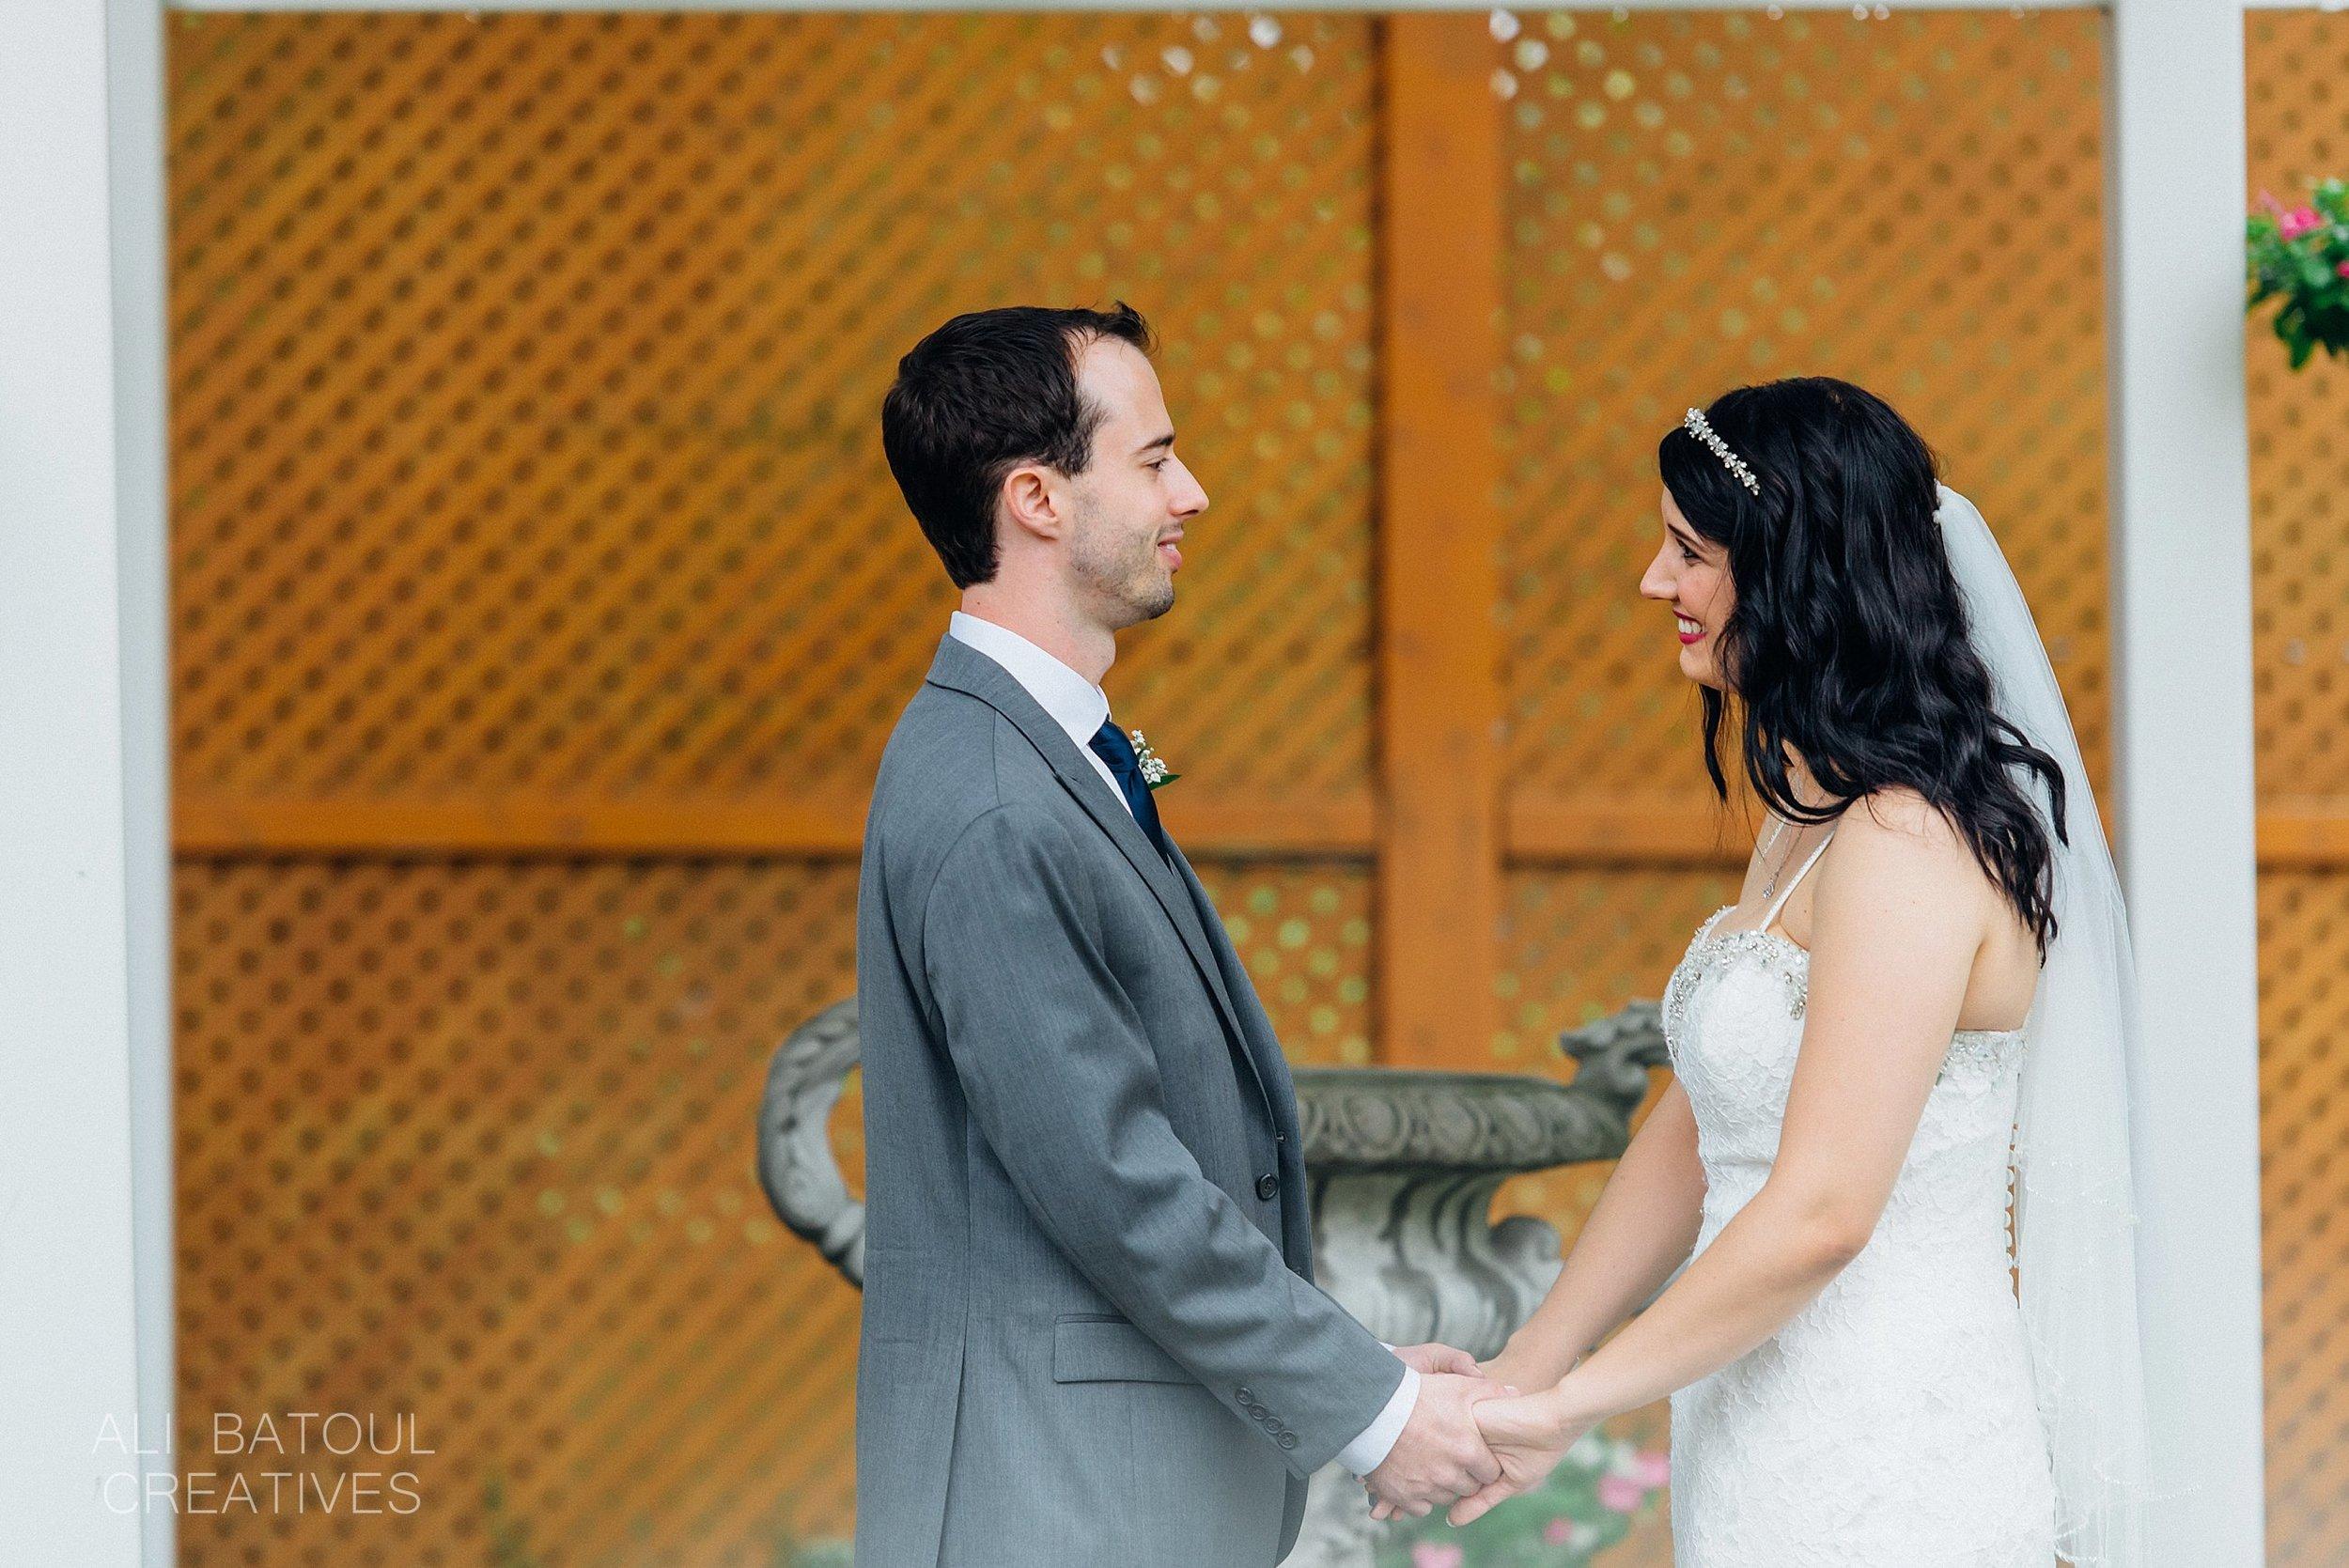 Jocelyn + Steve At The Schoolhouse Wedding - Ali and Batoul Fine Art Wedding Photography_0043.jpg